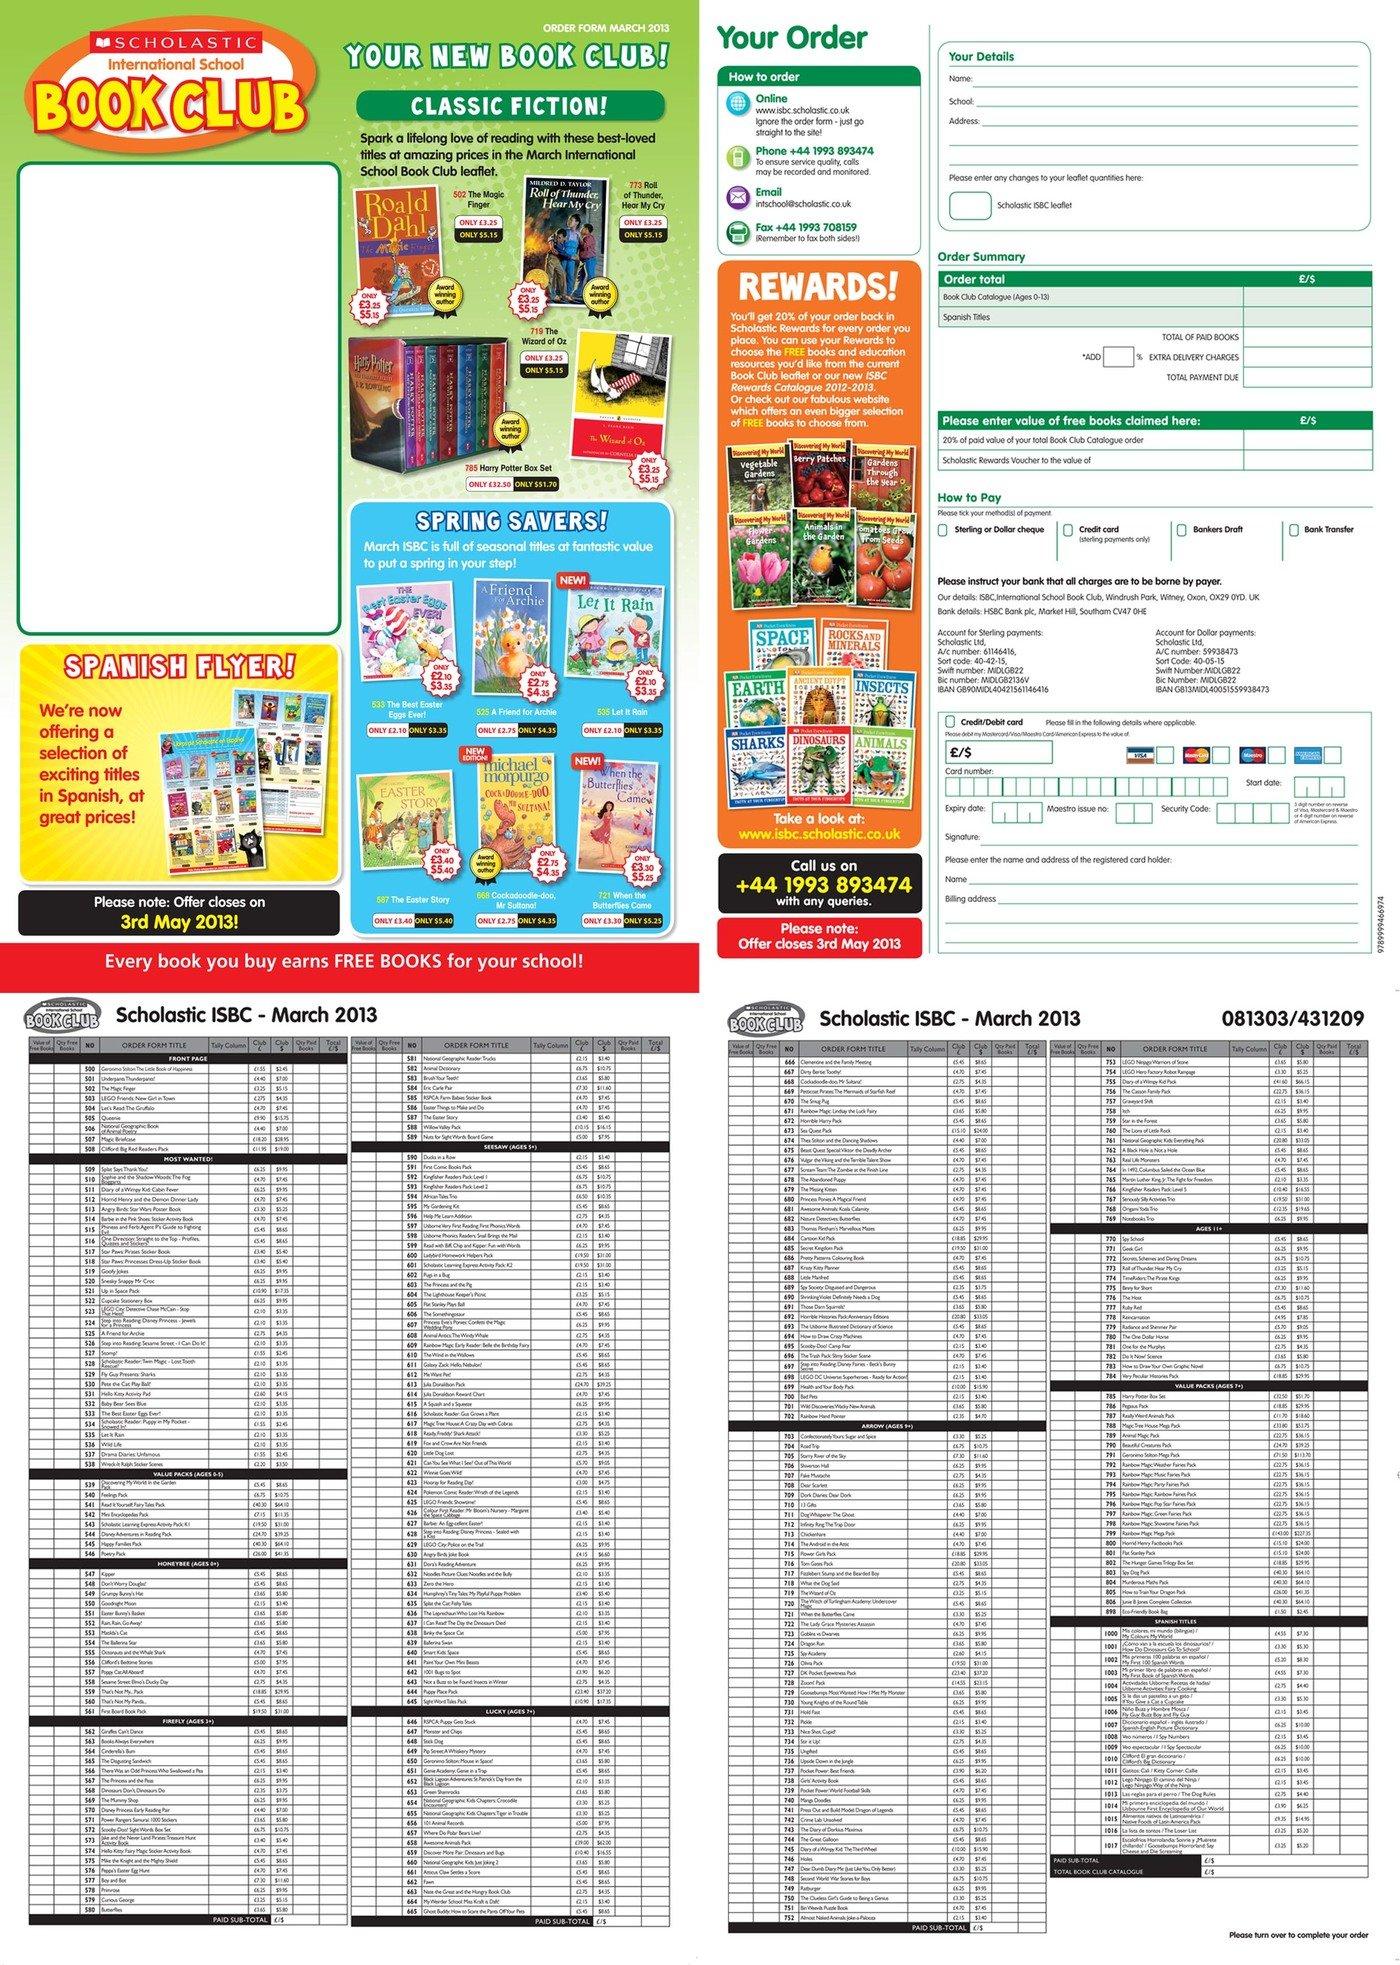 Scholastic Marketing Materials by Amy Hood at Coroflot.com